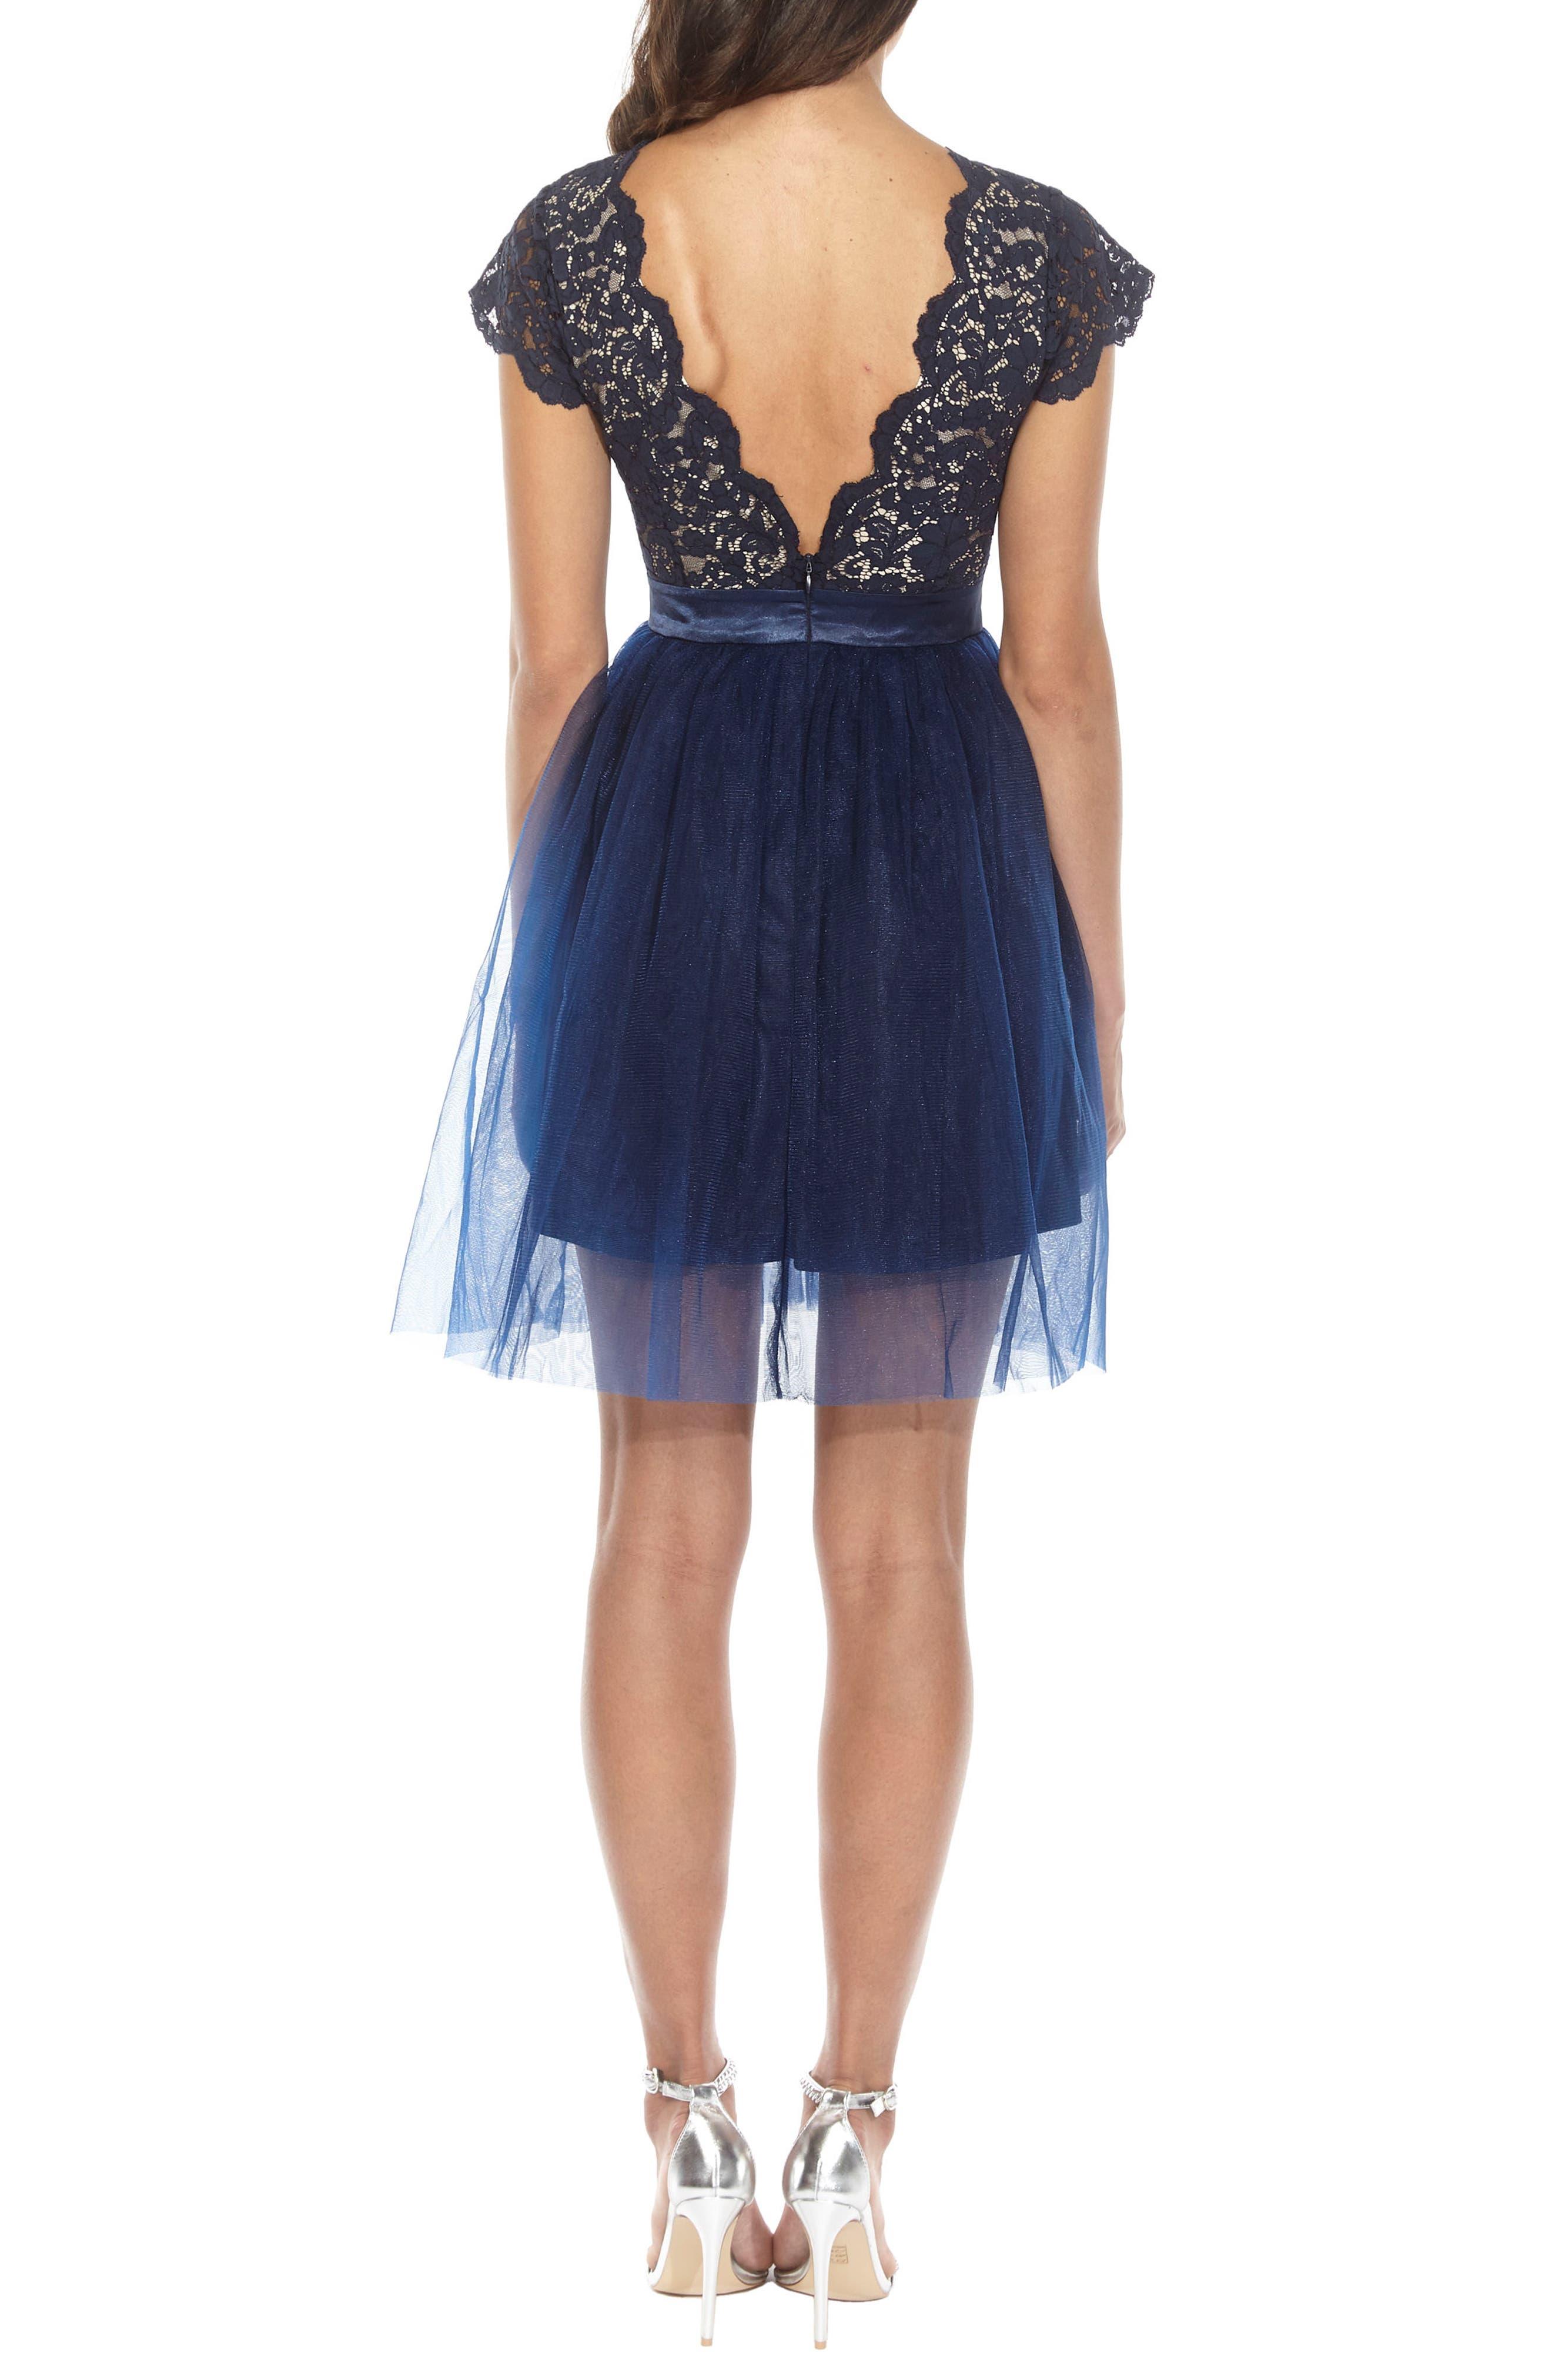 Macen Scalloped Lace Skater Dress,                             Alternate thumbnail 2, color,                             410